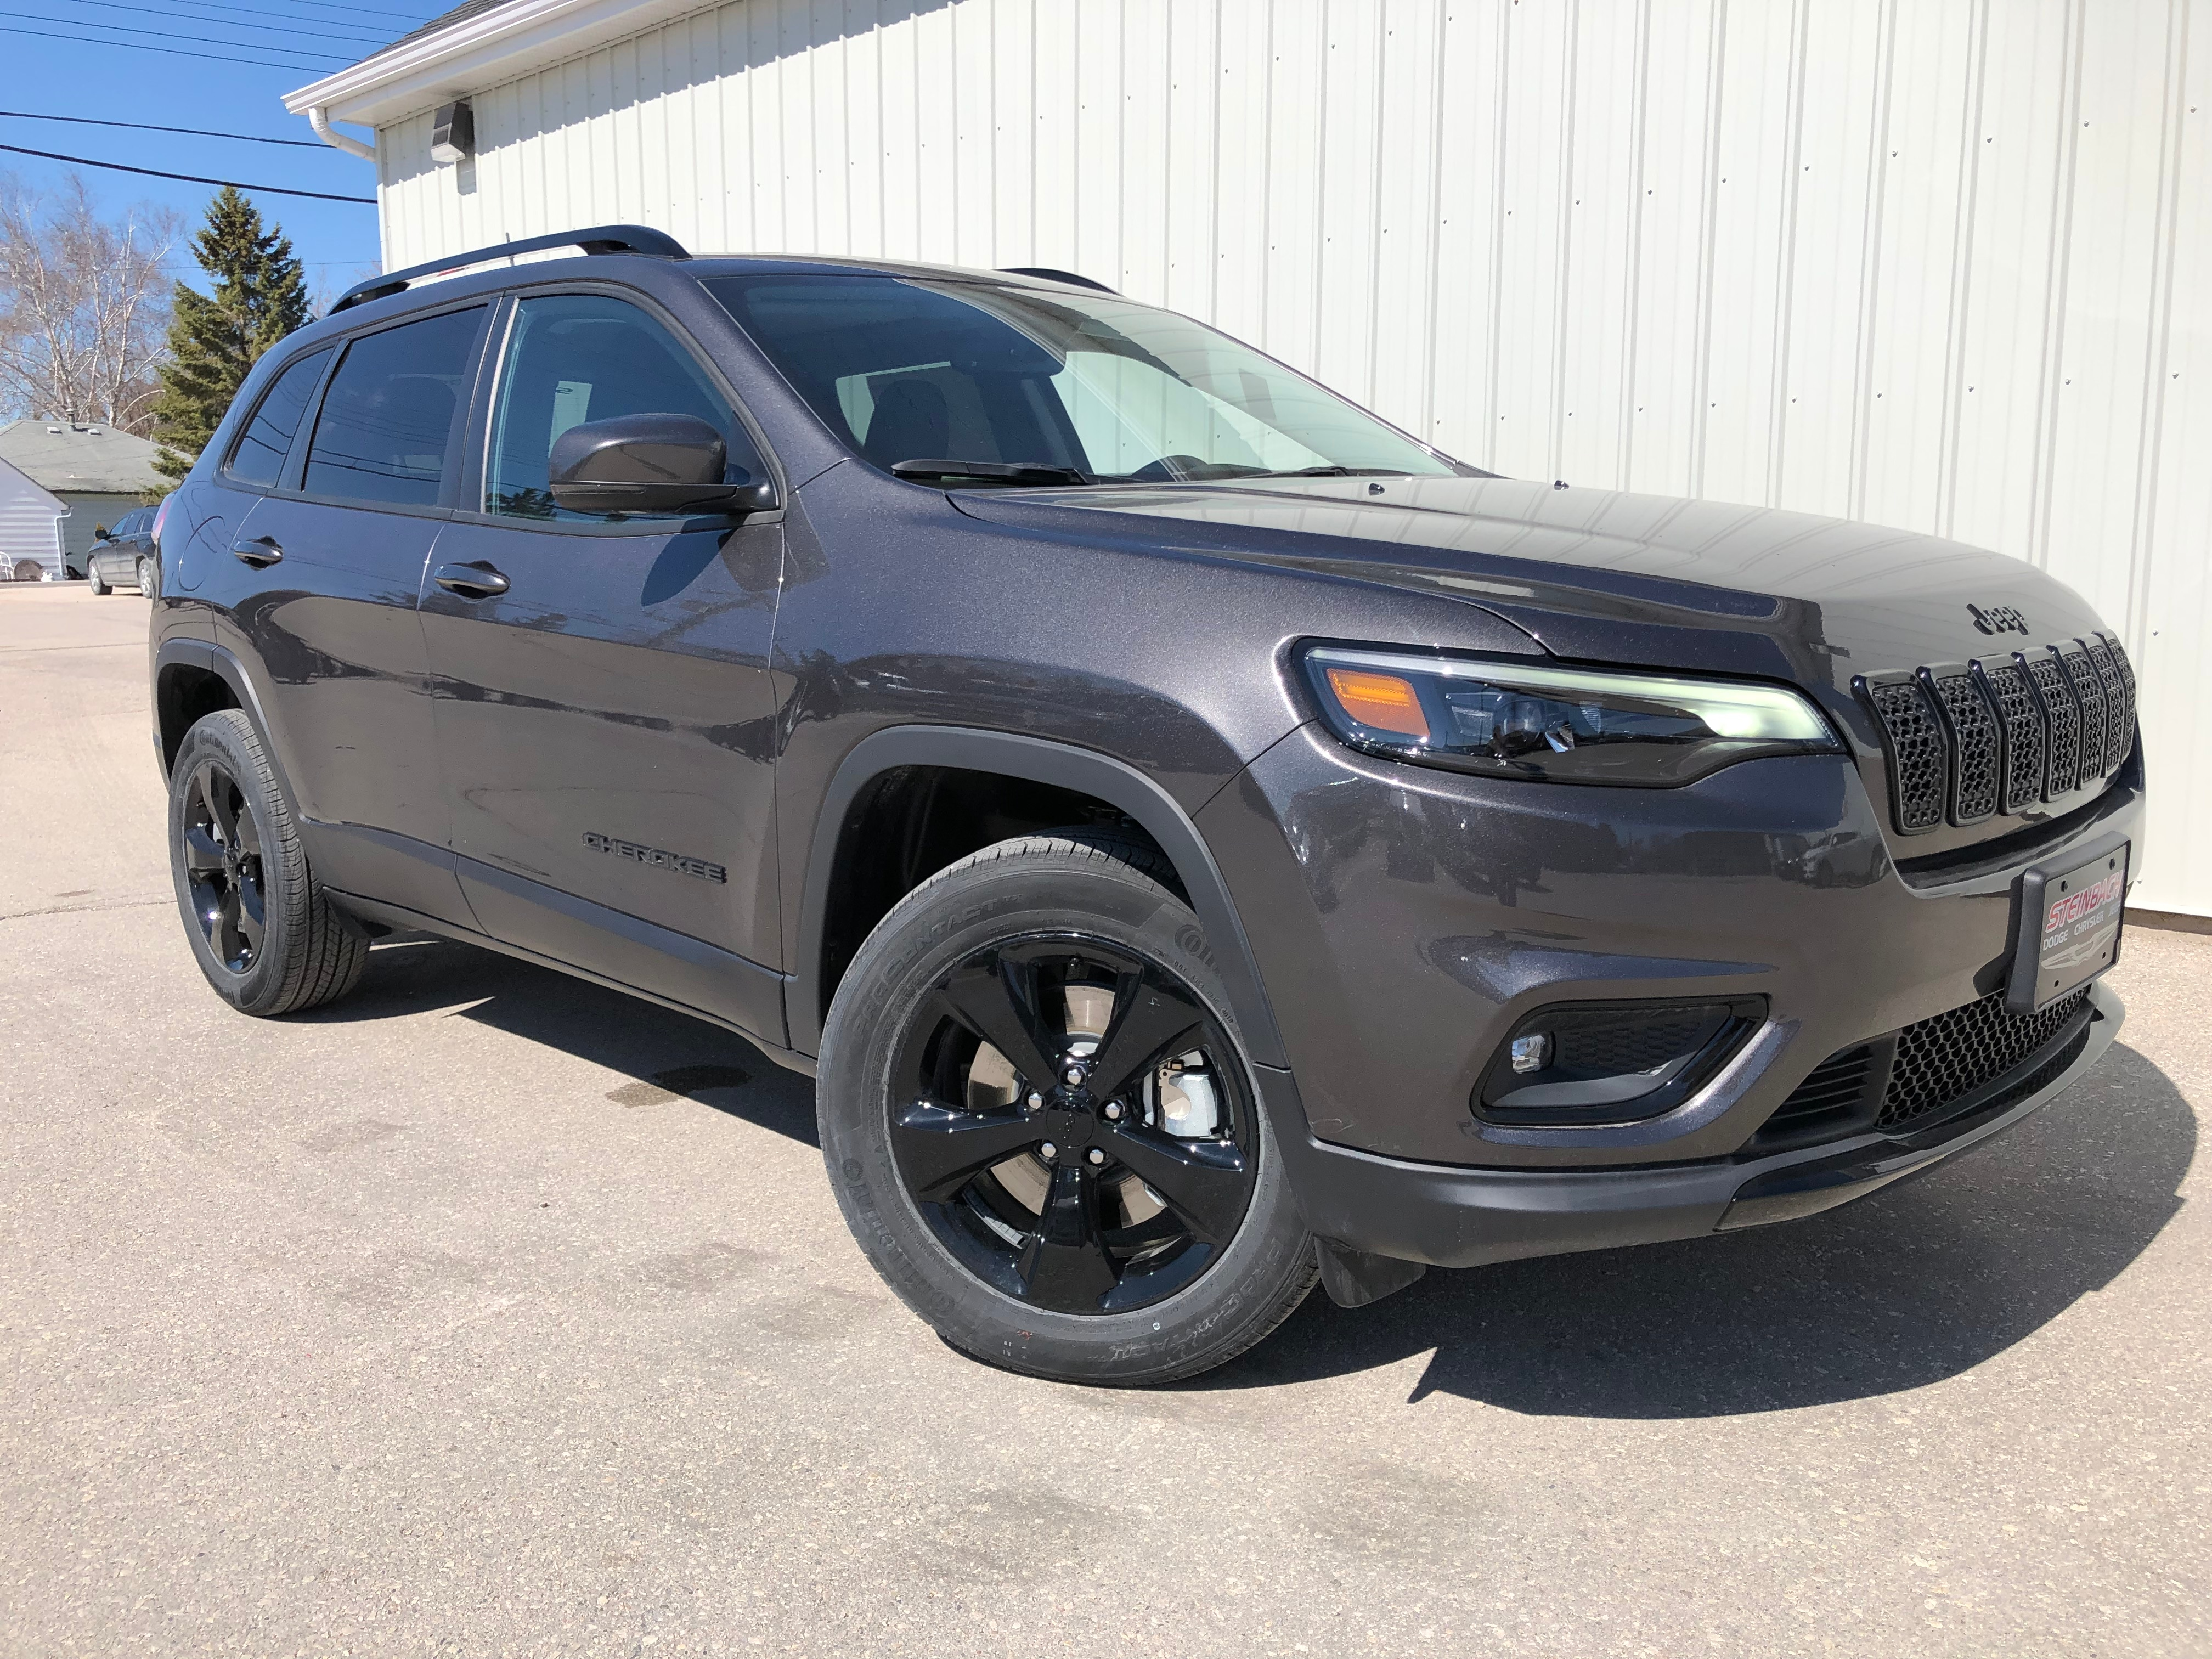 2019 Jeep New Cherokee Altitude Heated Seats, Remote Start, Floor Mats SUV